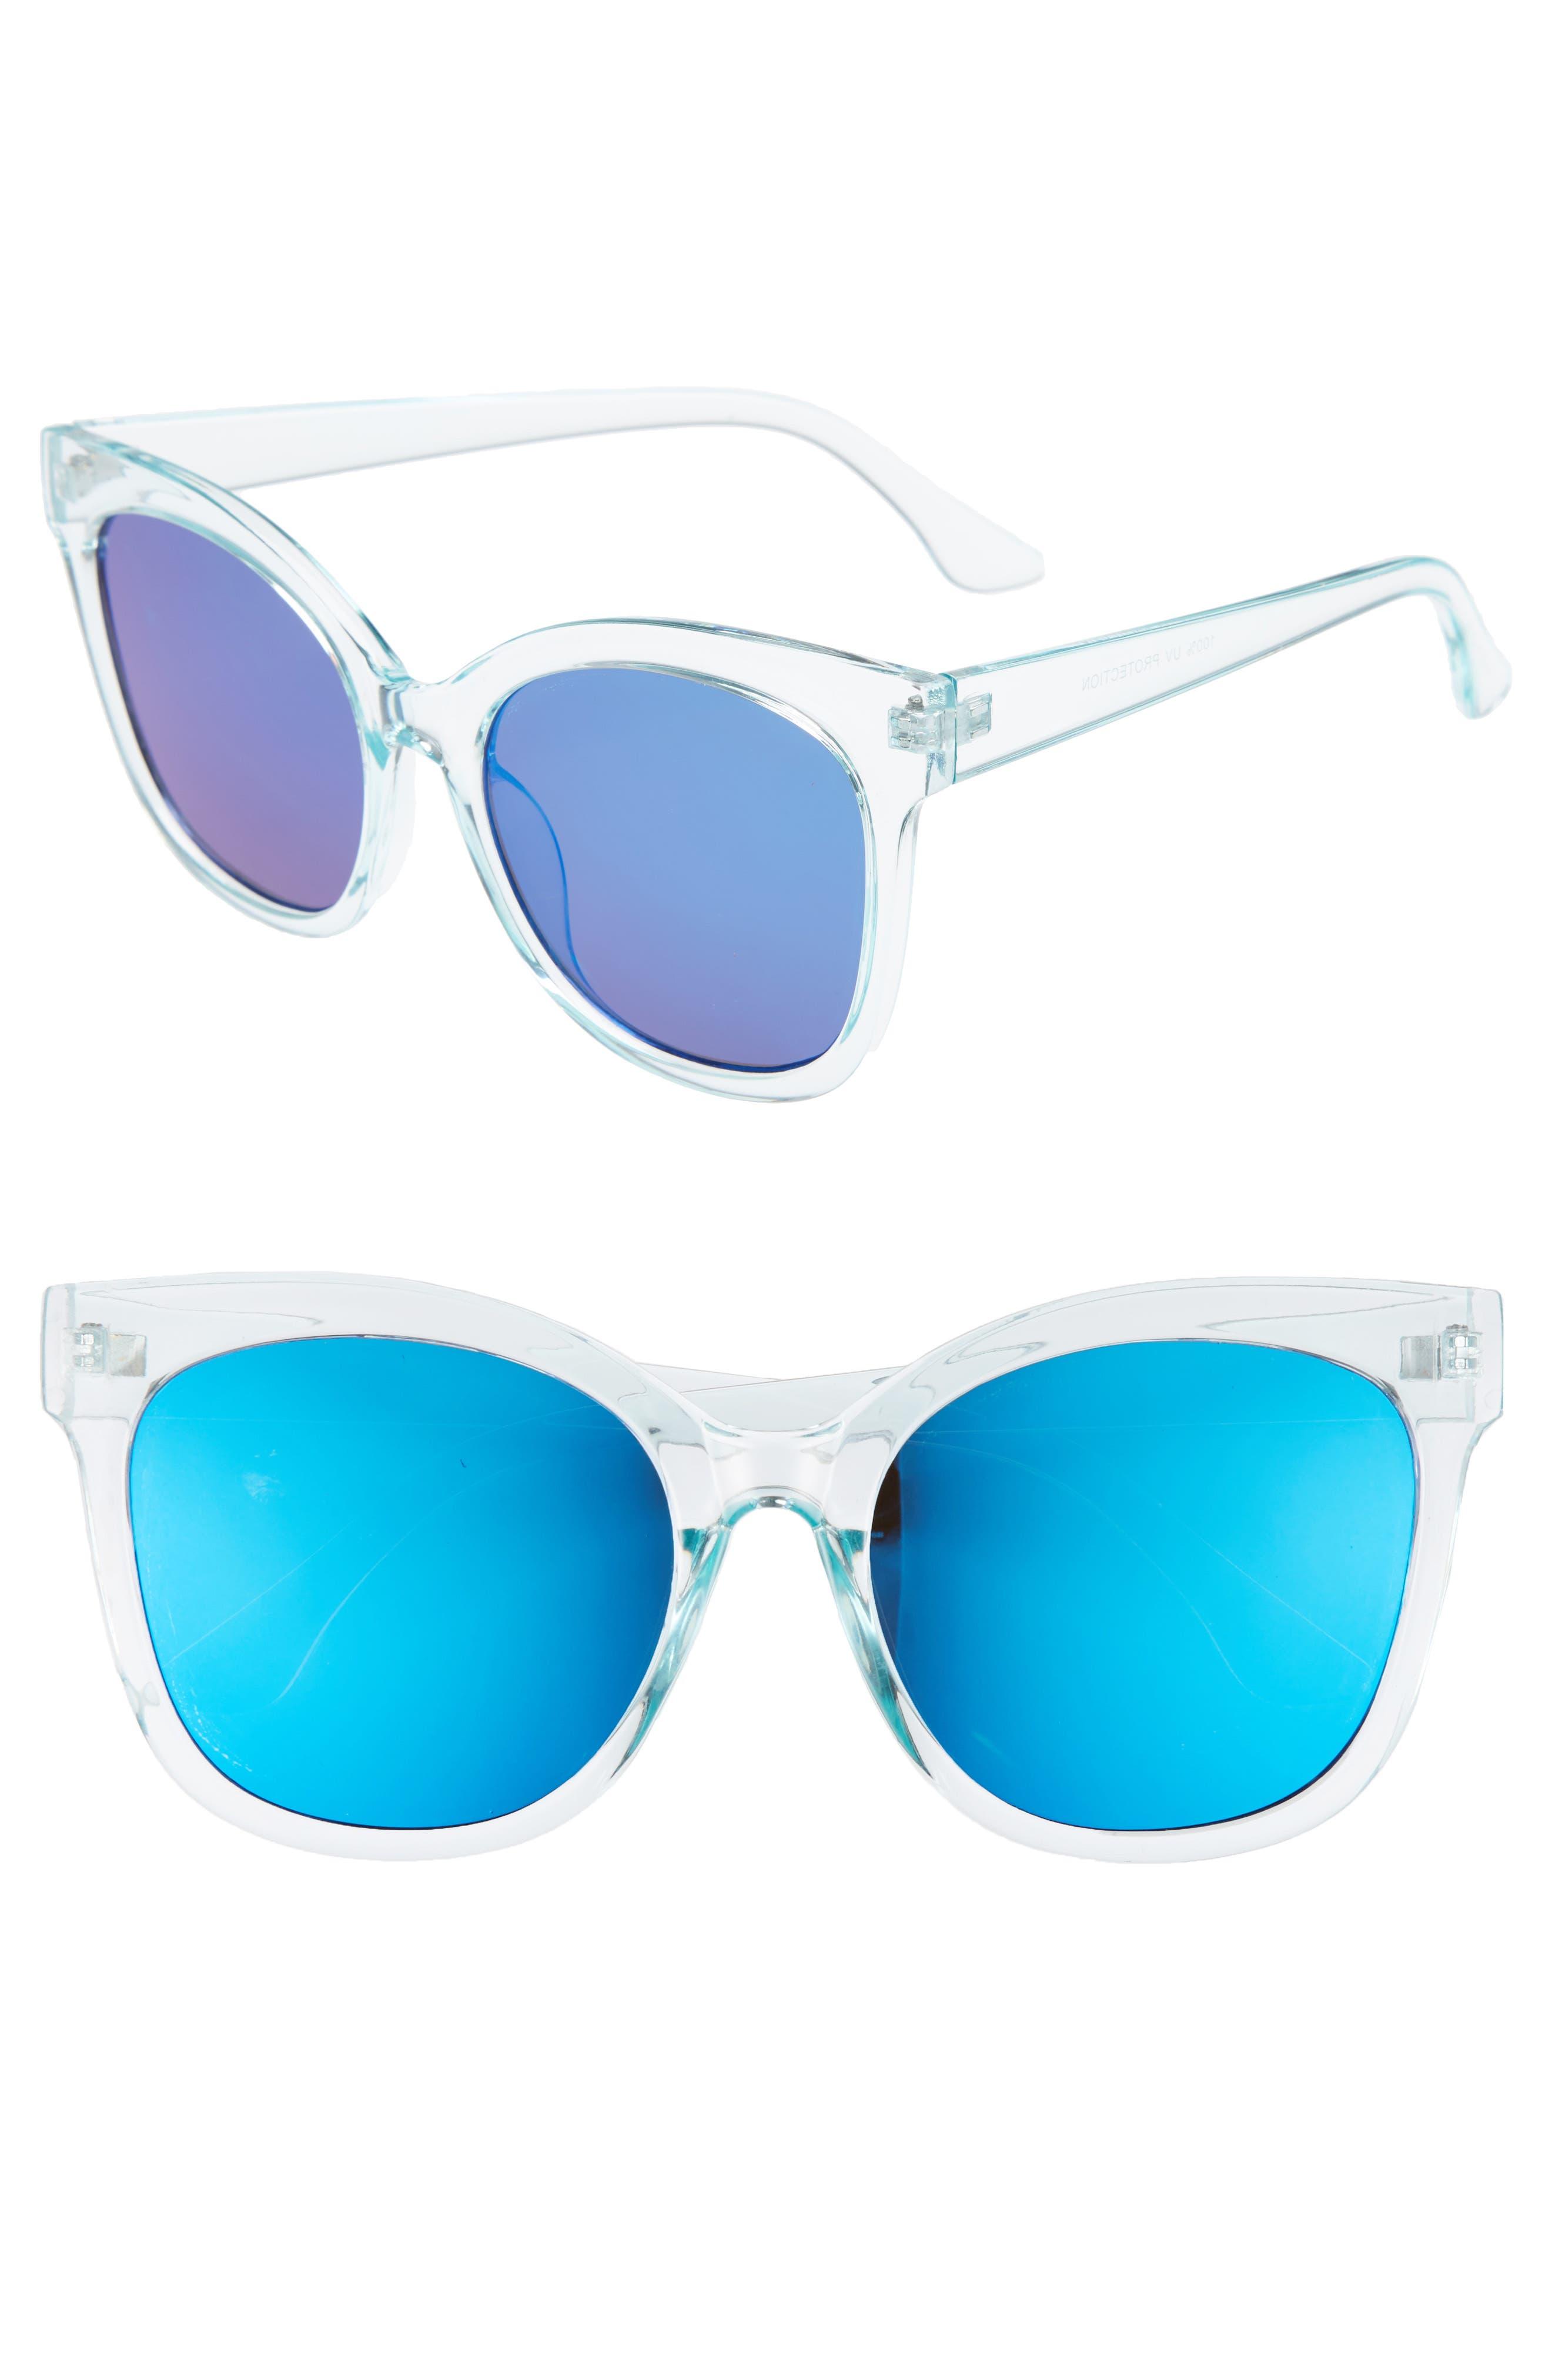 57mm Cat Eye Sunglasses,                         Main,                         color, 300